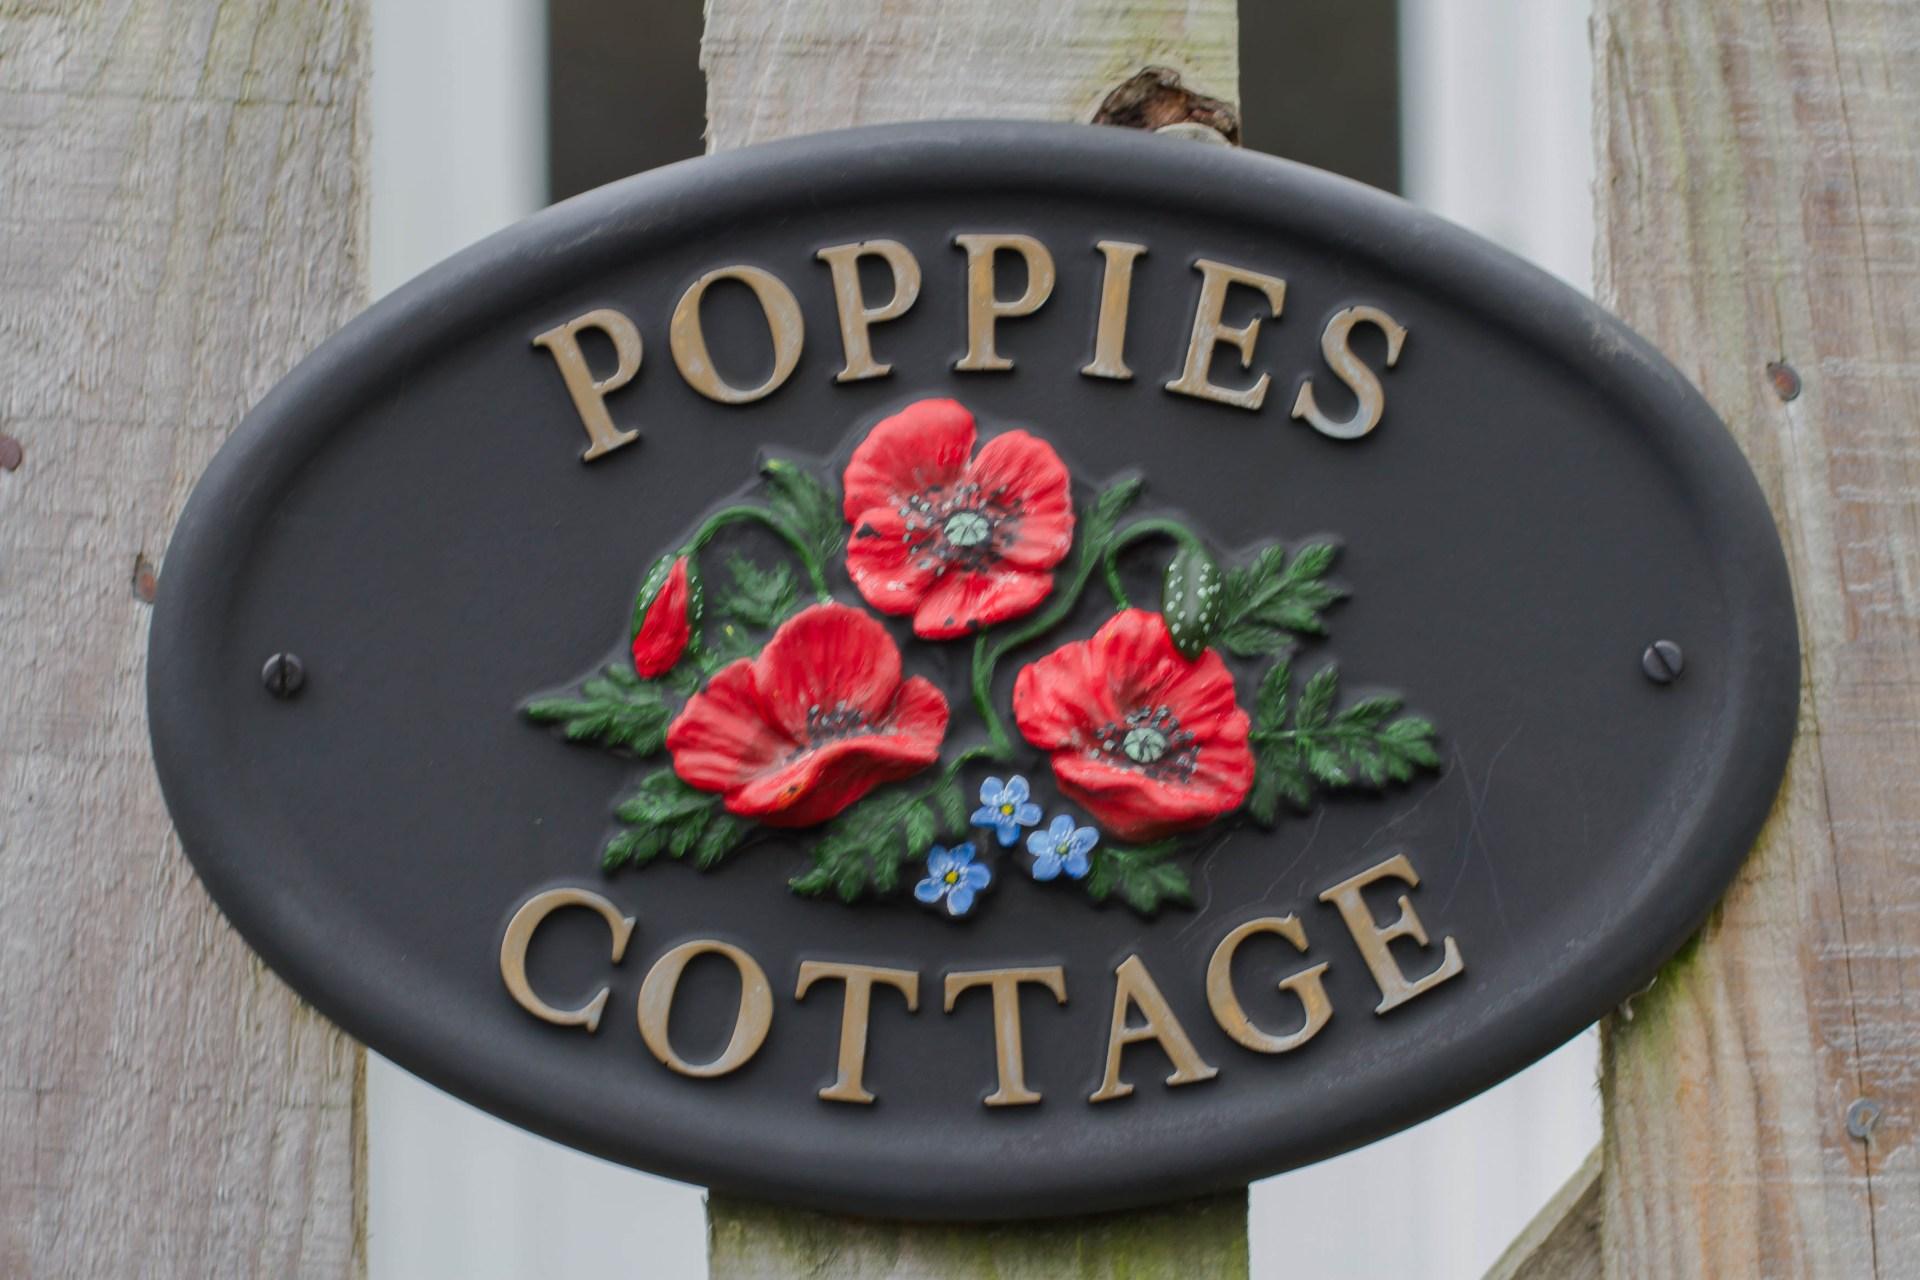 Poppies Cottage, Isle of Mull, Scotland